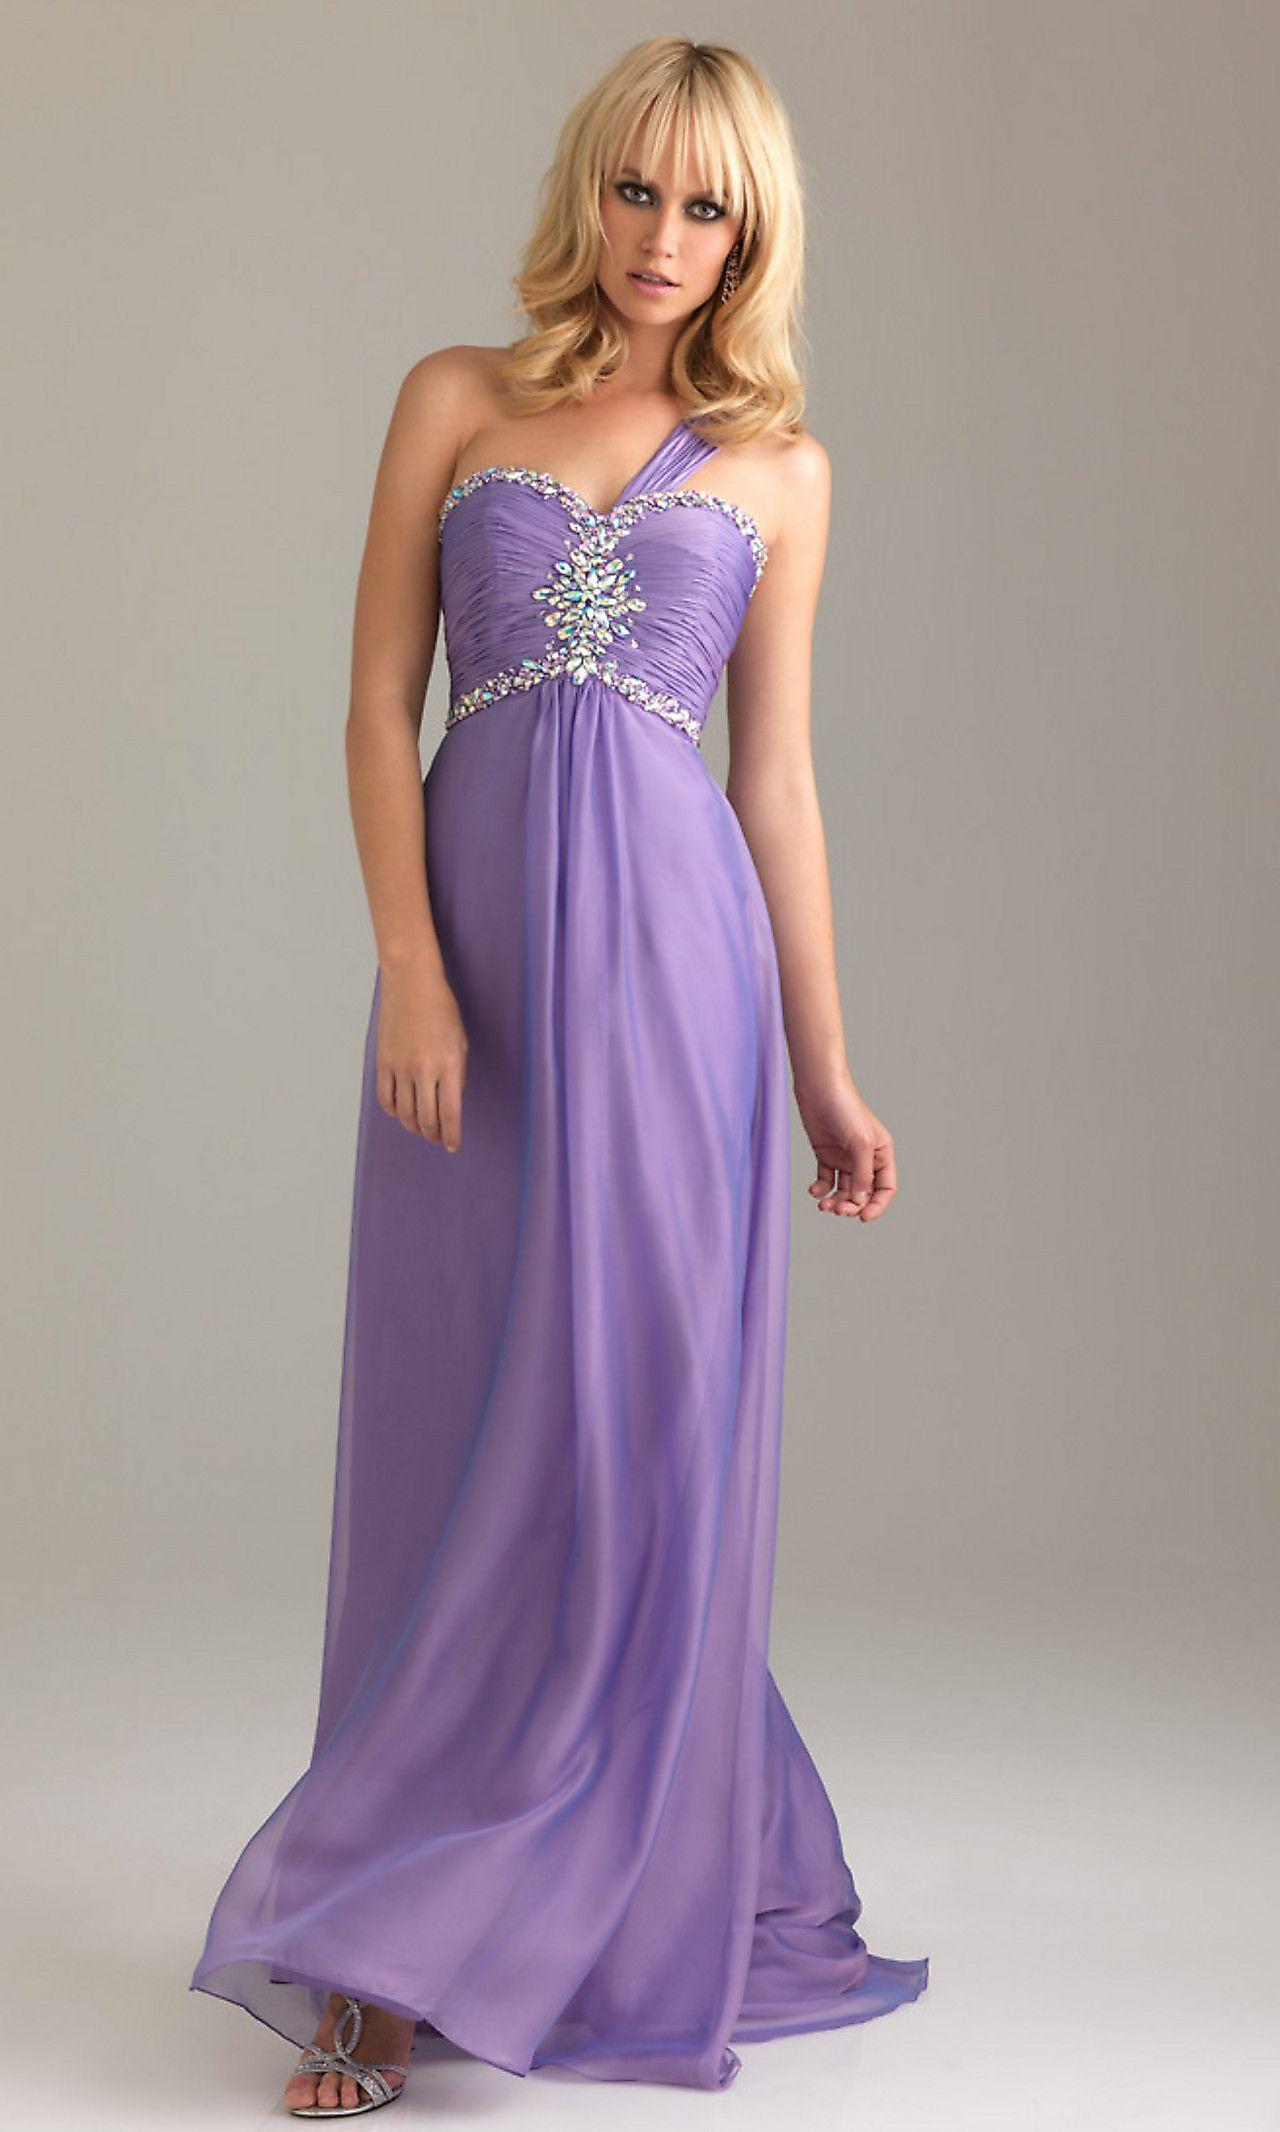 Elegant Long One Shoulder Night Moves Dress 6415 NM-6415 again, minus the strap.